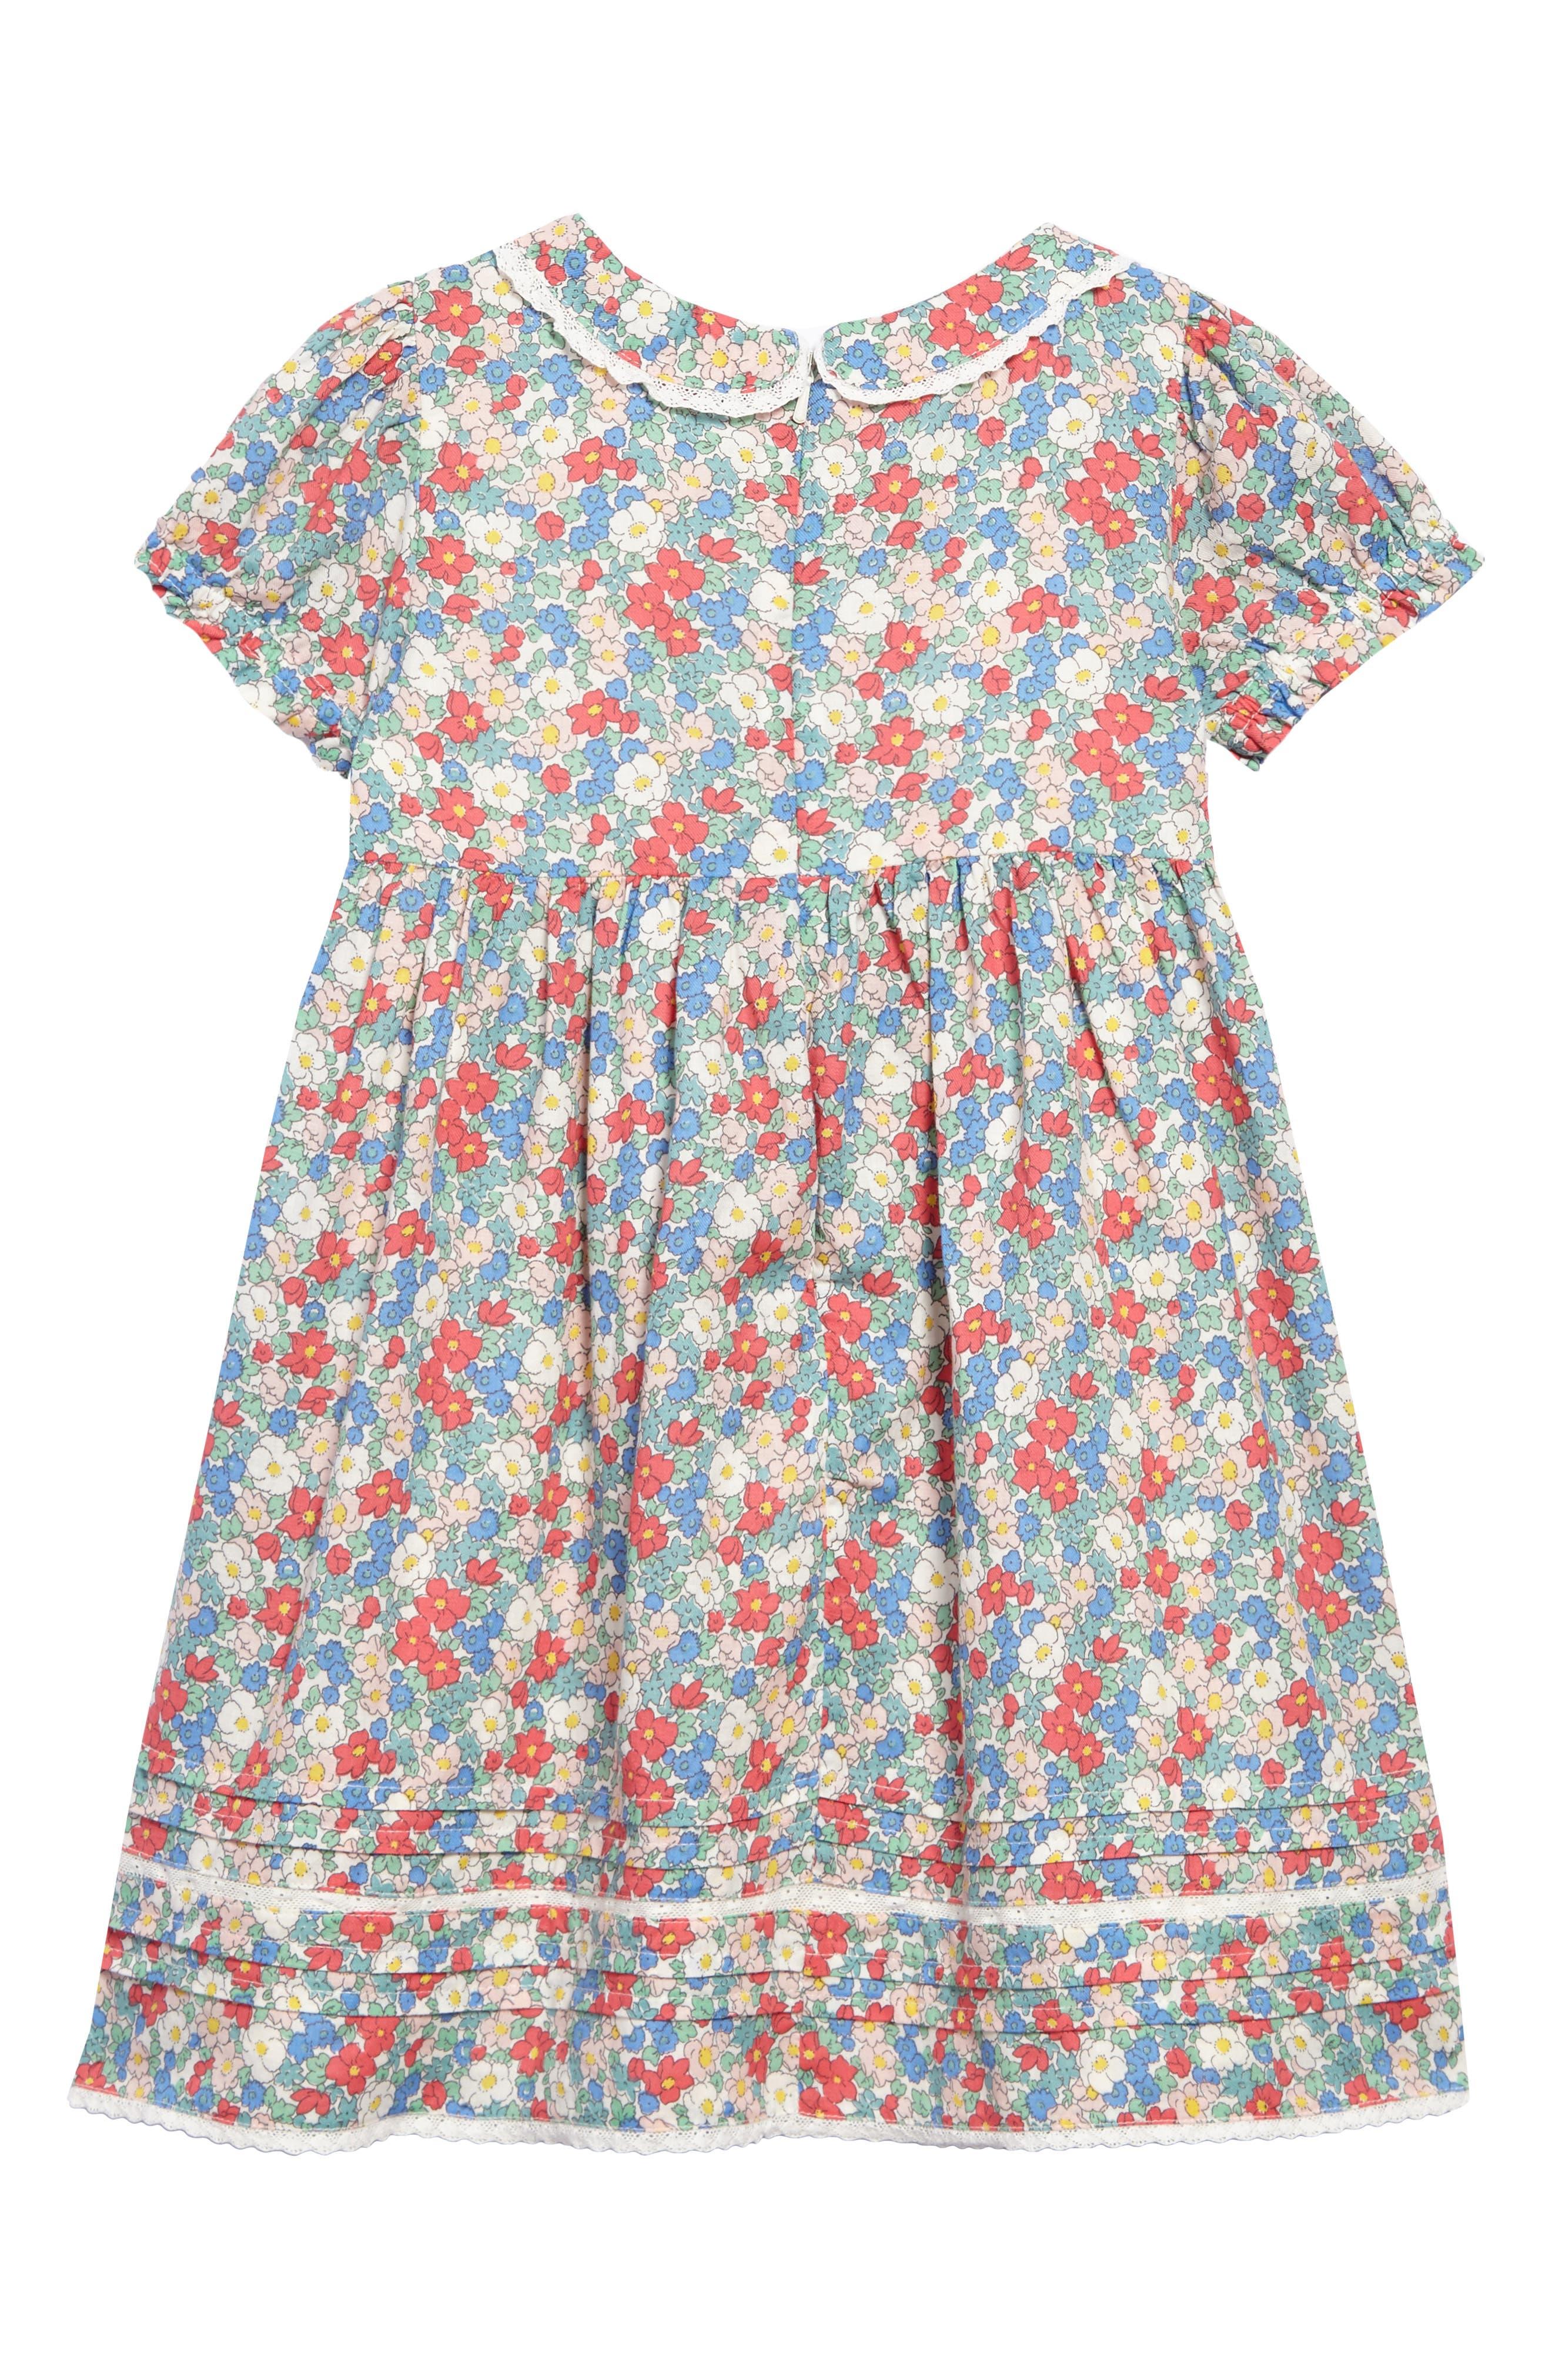 Nostalgic Woven Dress,                             Alternate thumbnail 2, color,                             606